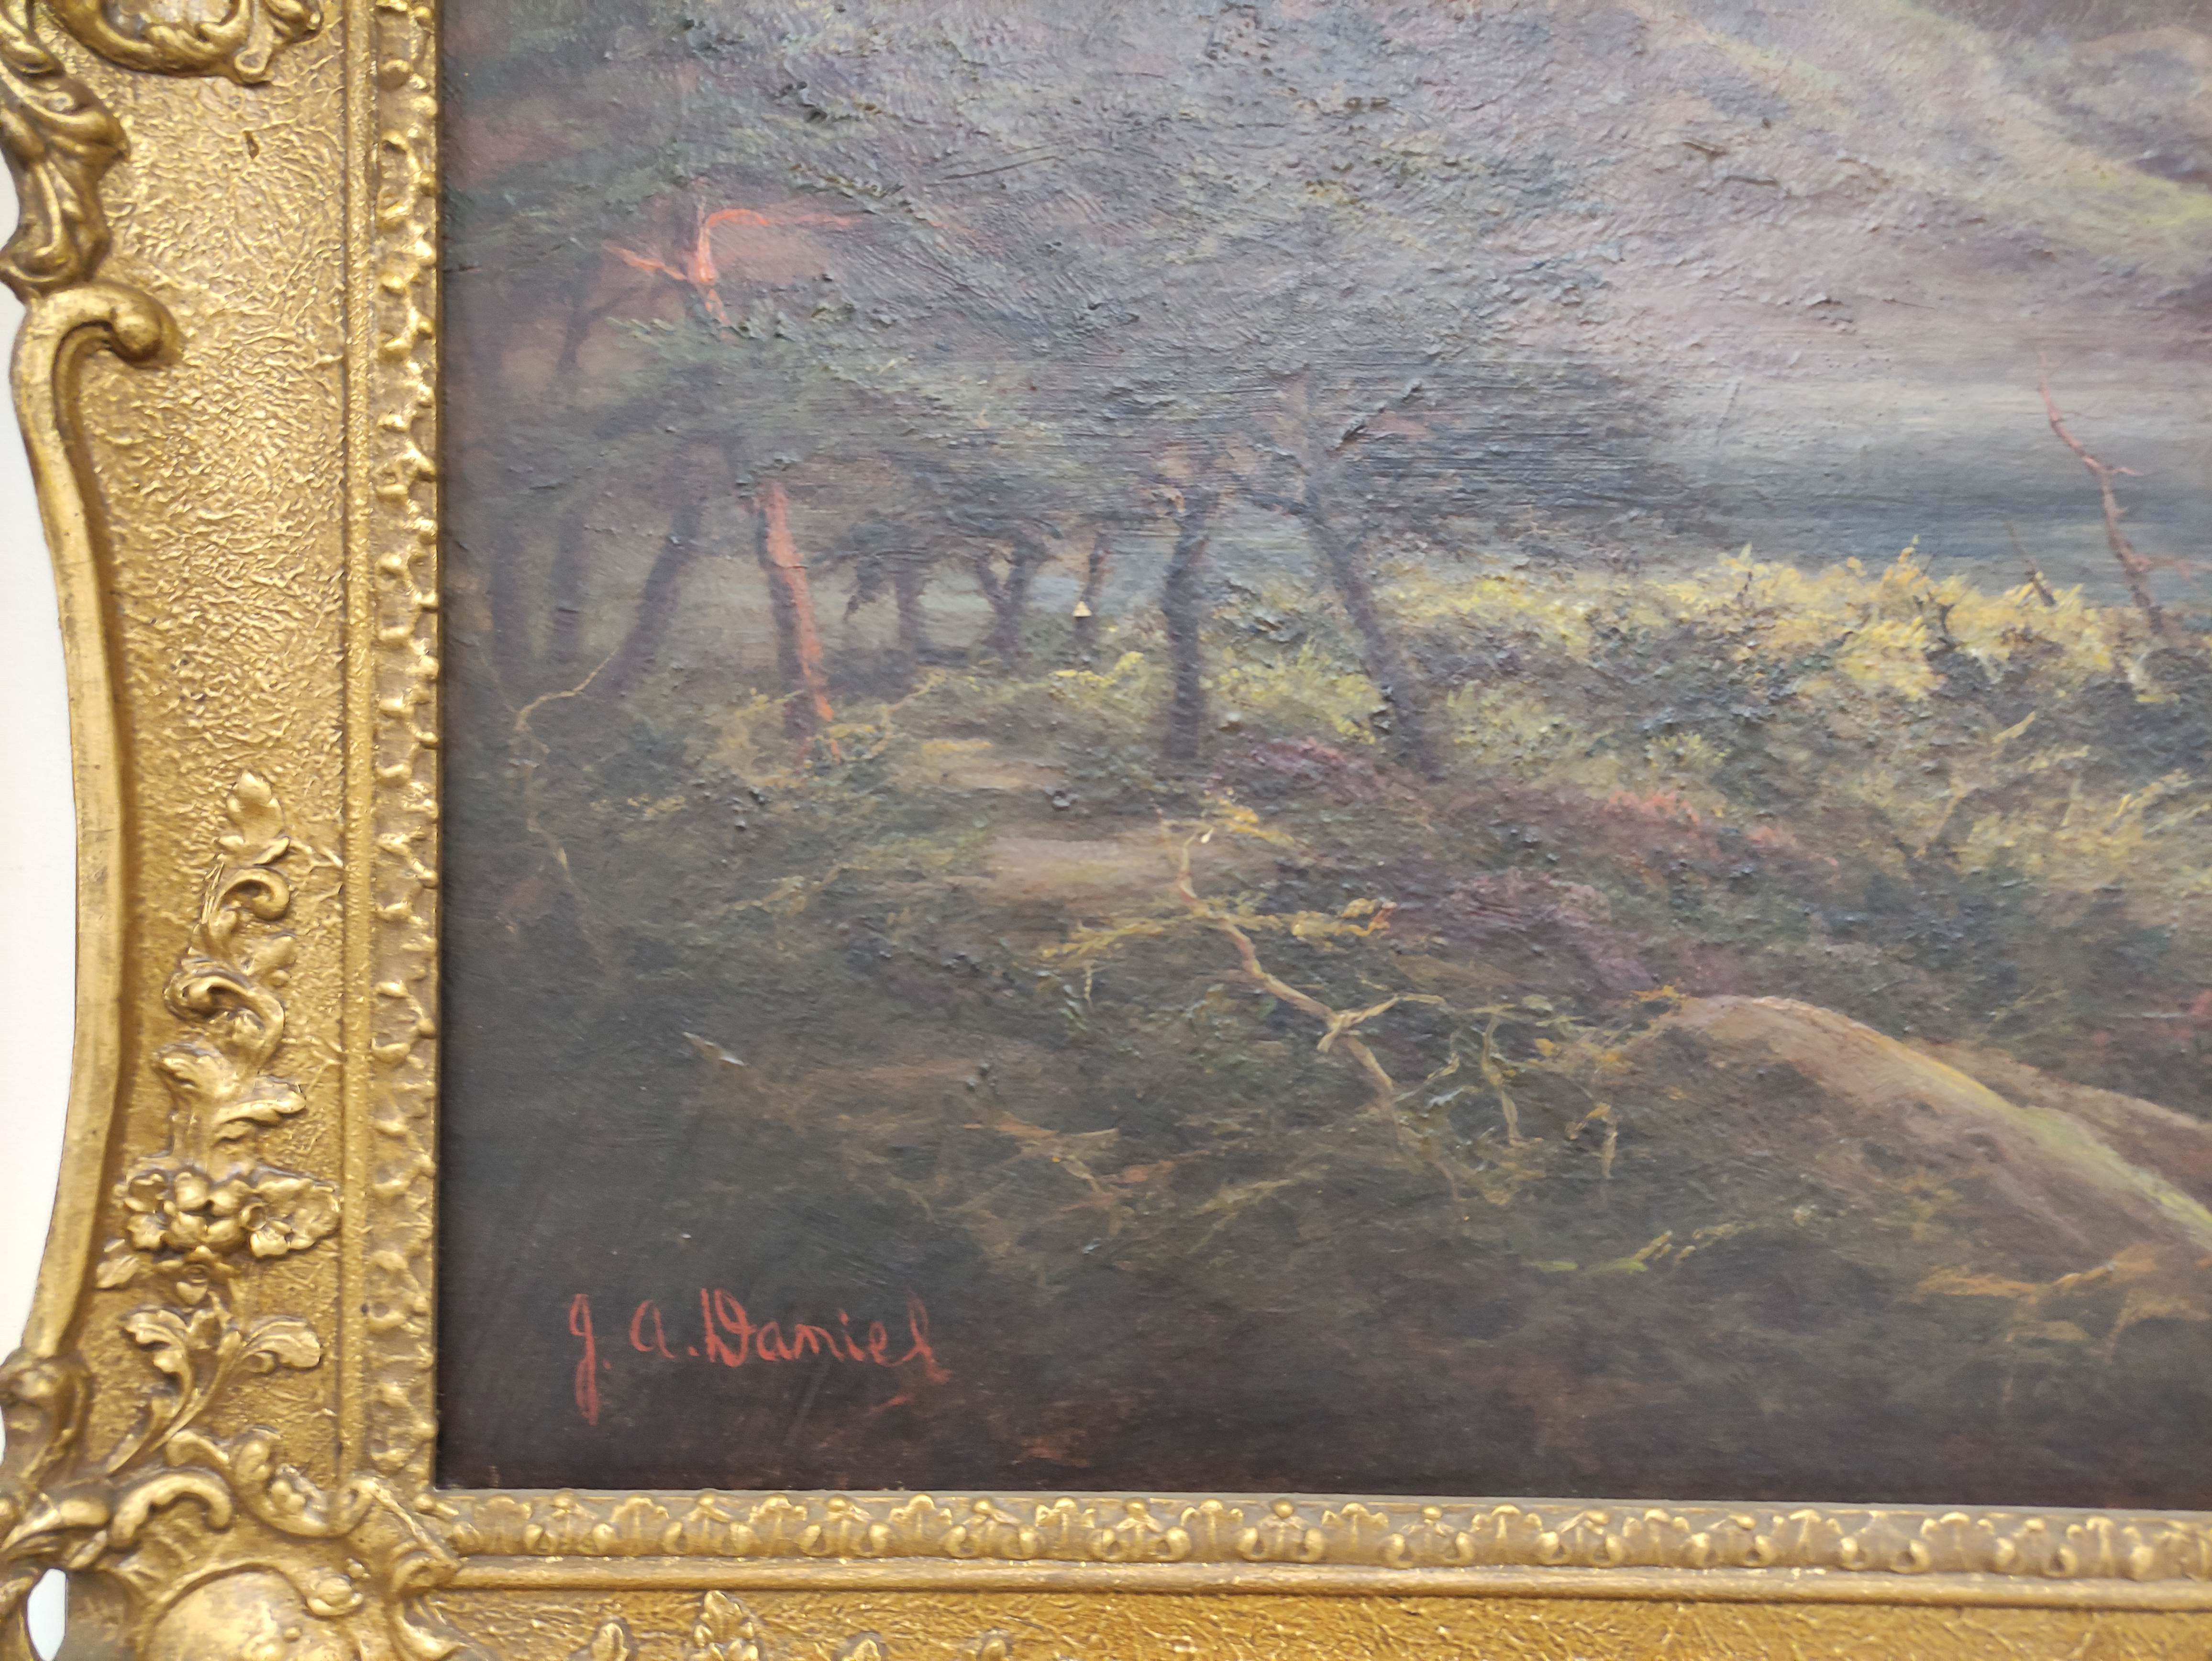 J. A. DANIEL. Loch Aylort. Signed, oil on canvas. 60cm x 90cm. - Image 2 of 3